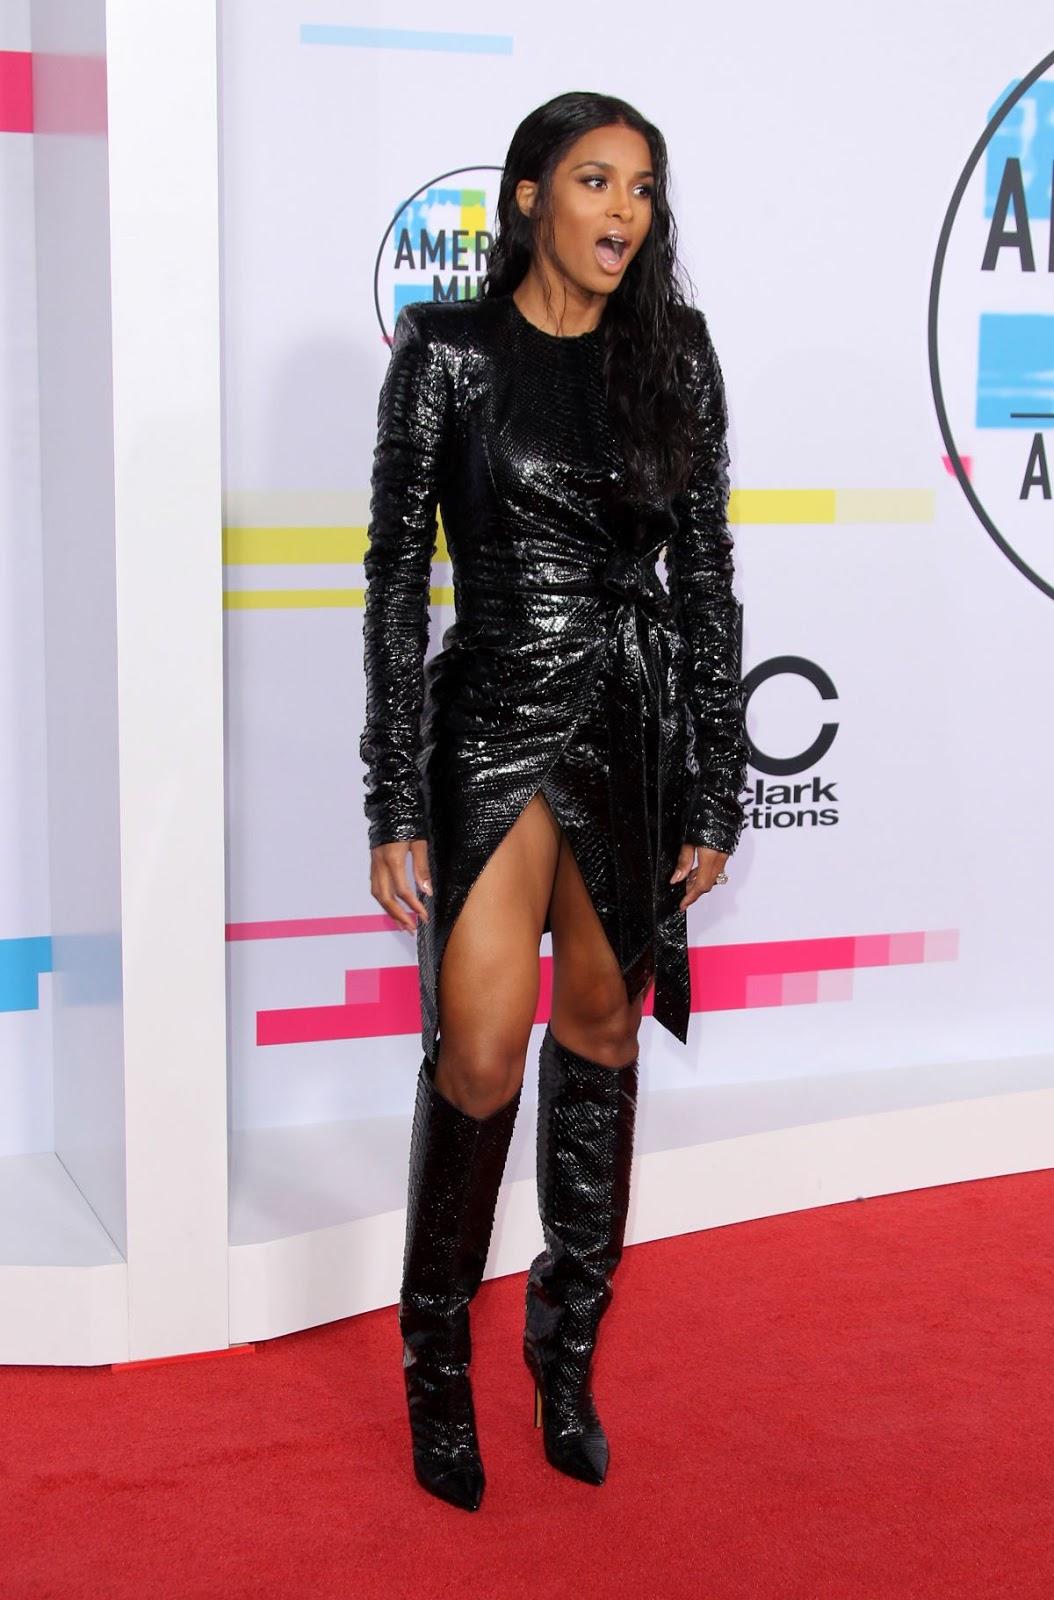 Photos of Ciara at American Music Awards 2017 at Microsoft Theater in Los Angeles